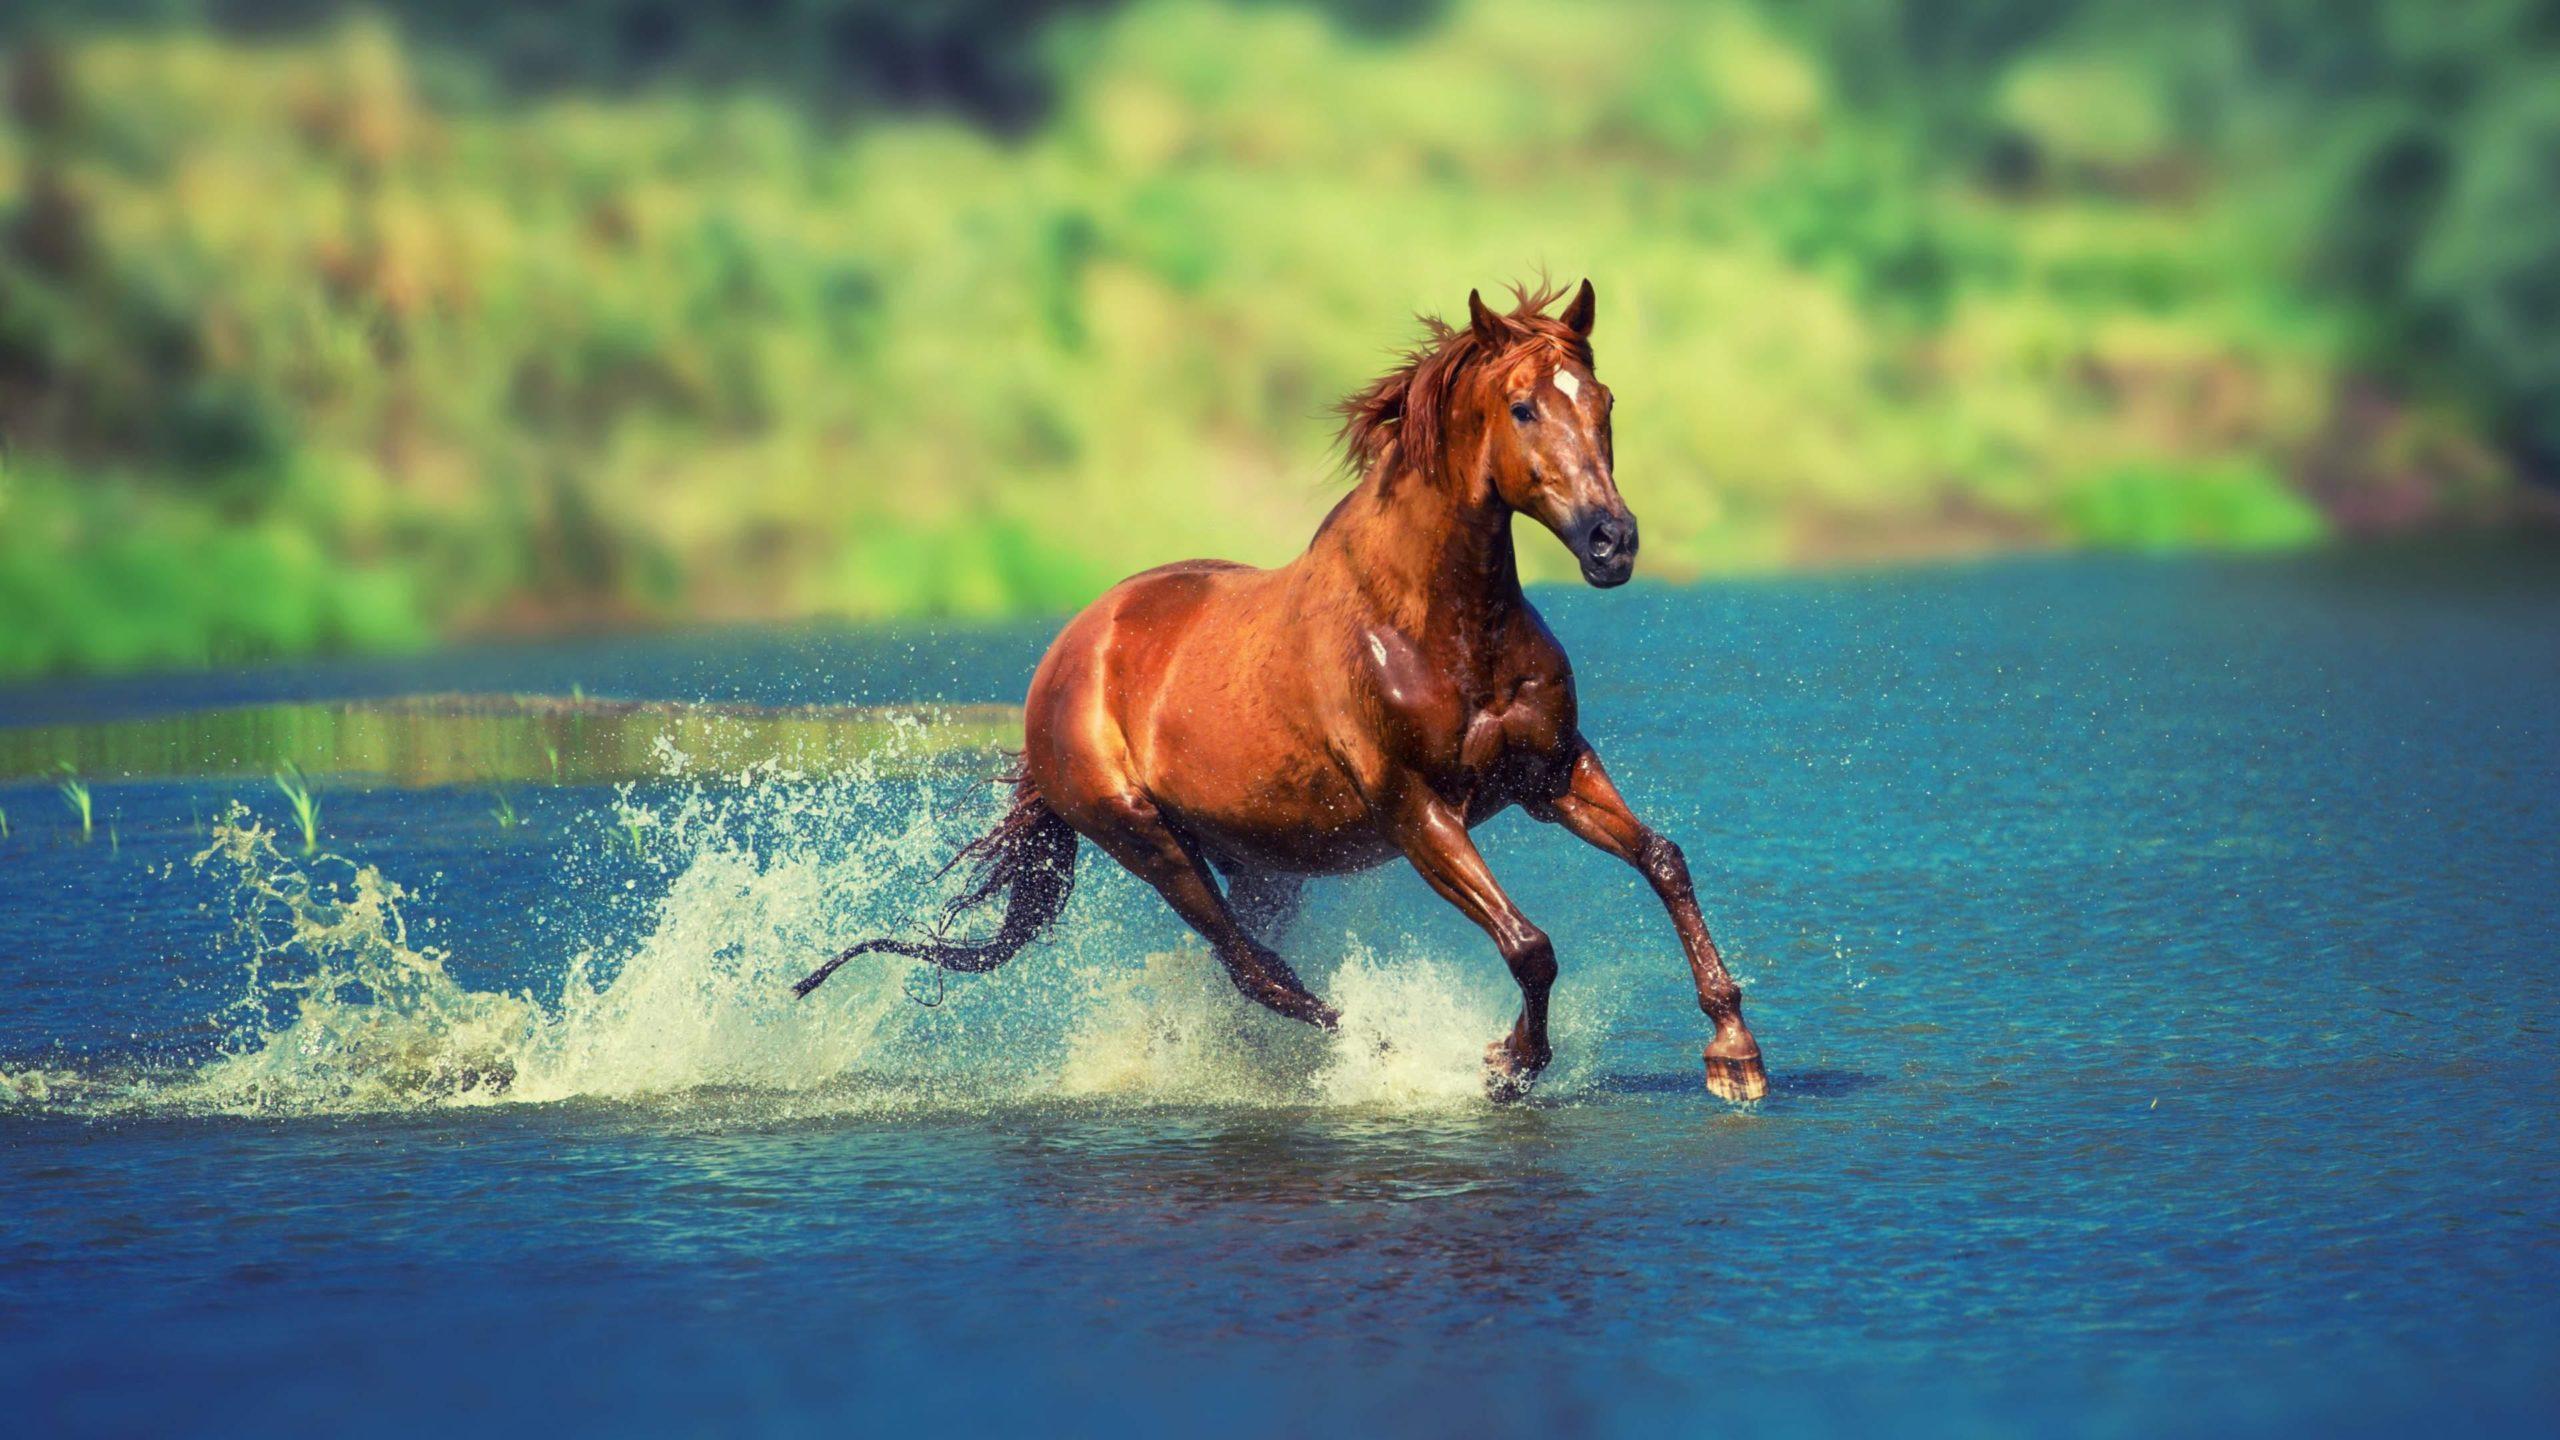 running horse wallpaper